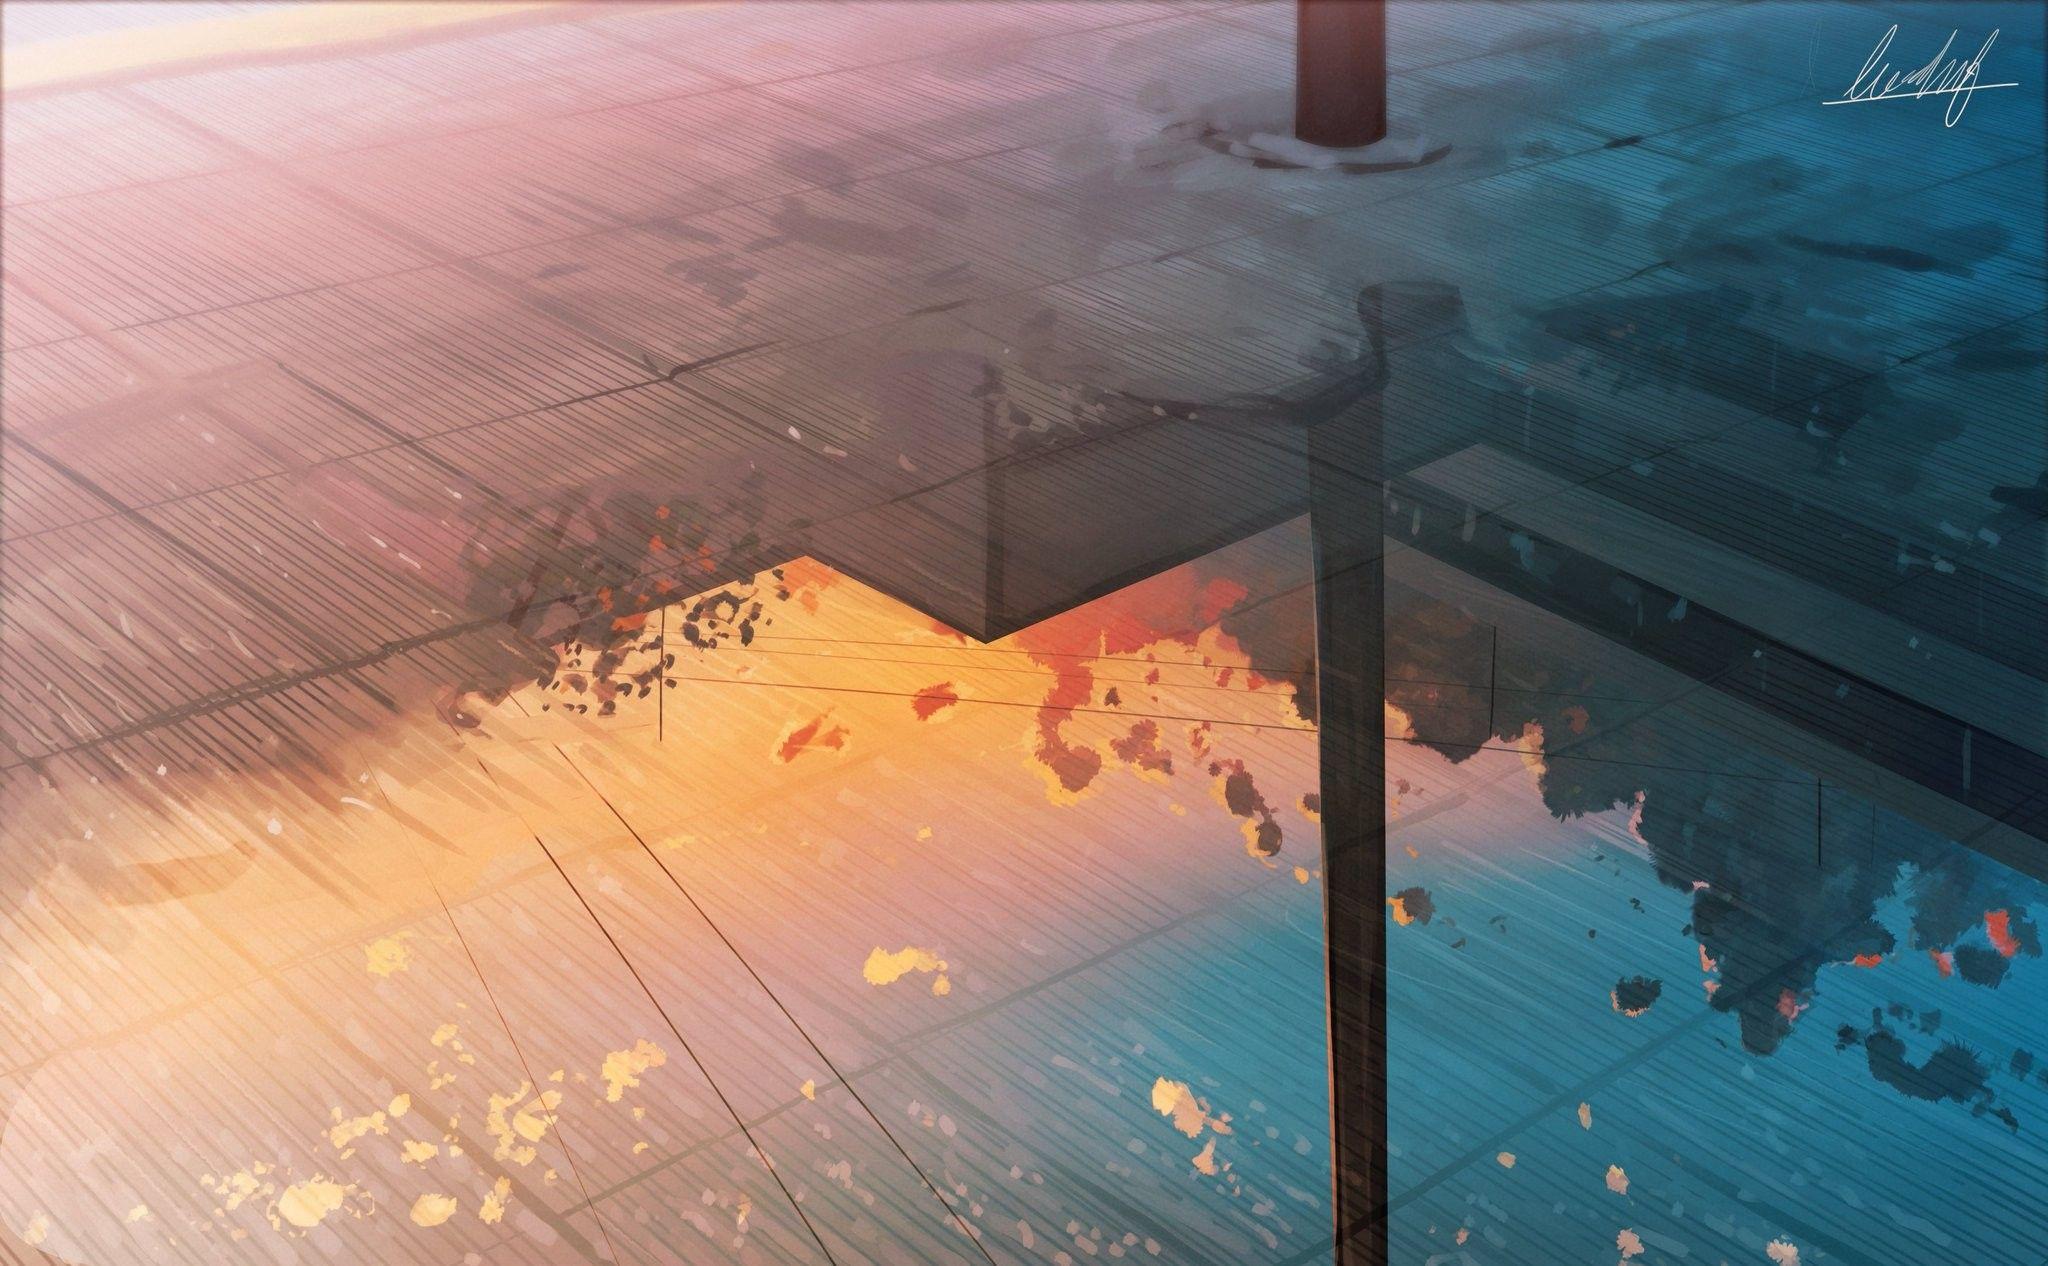 anime scenery おしゃれまとめの人気アイデア pinterest nyyoro イラスト 景色 漫画イラスト